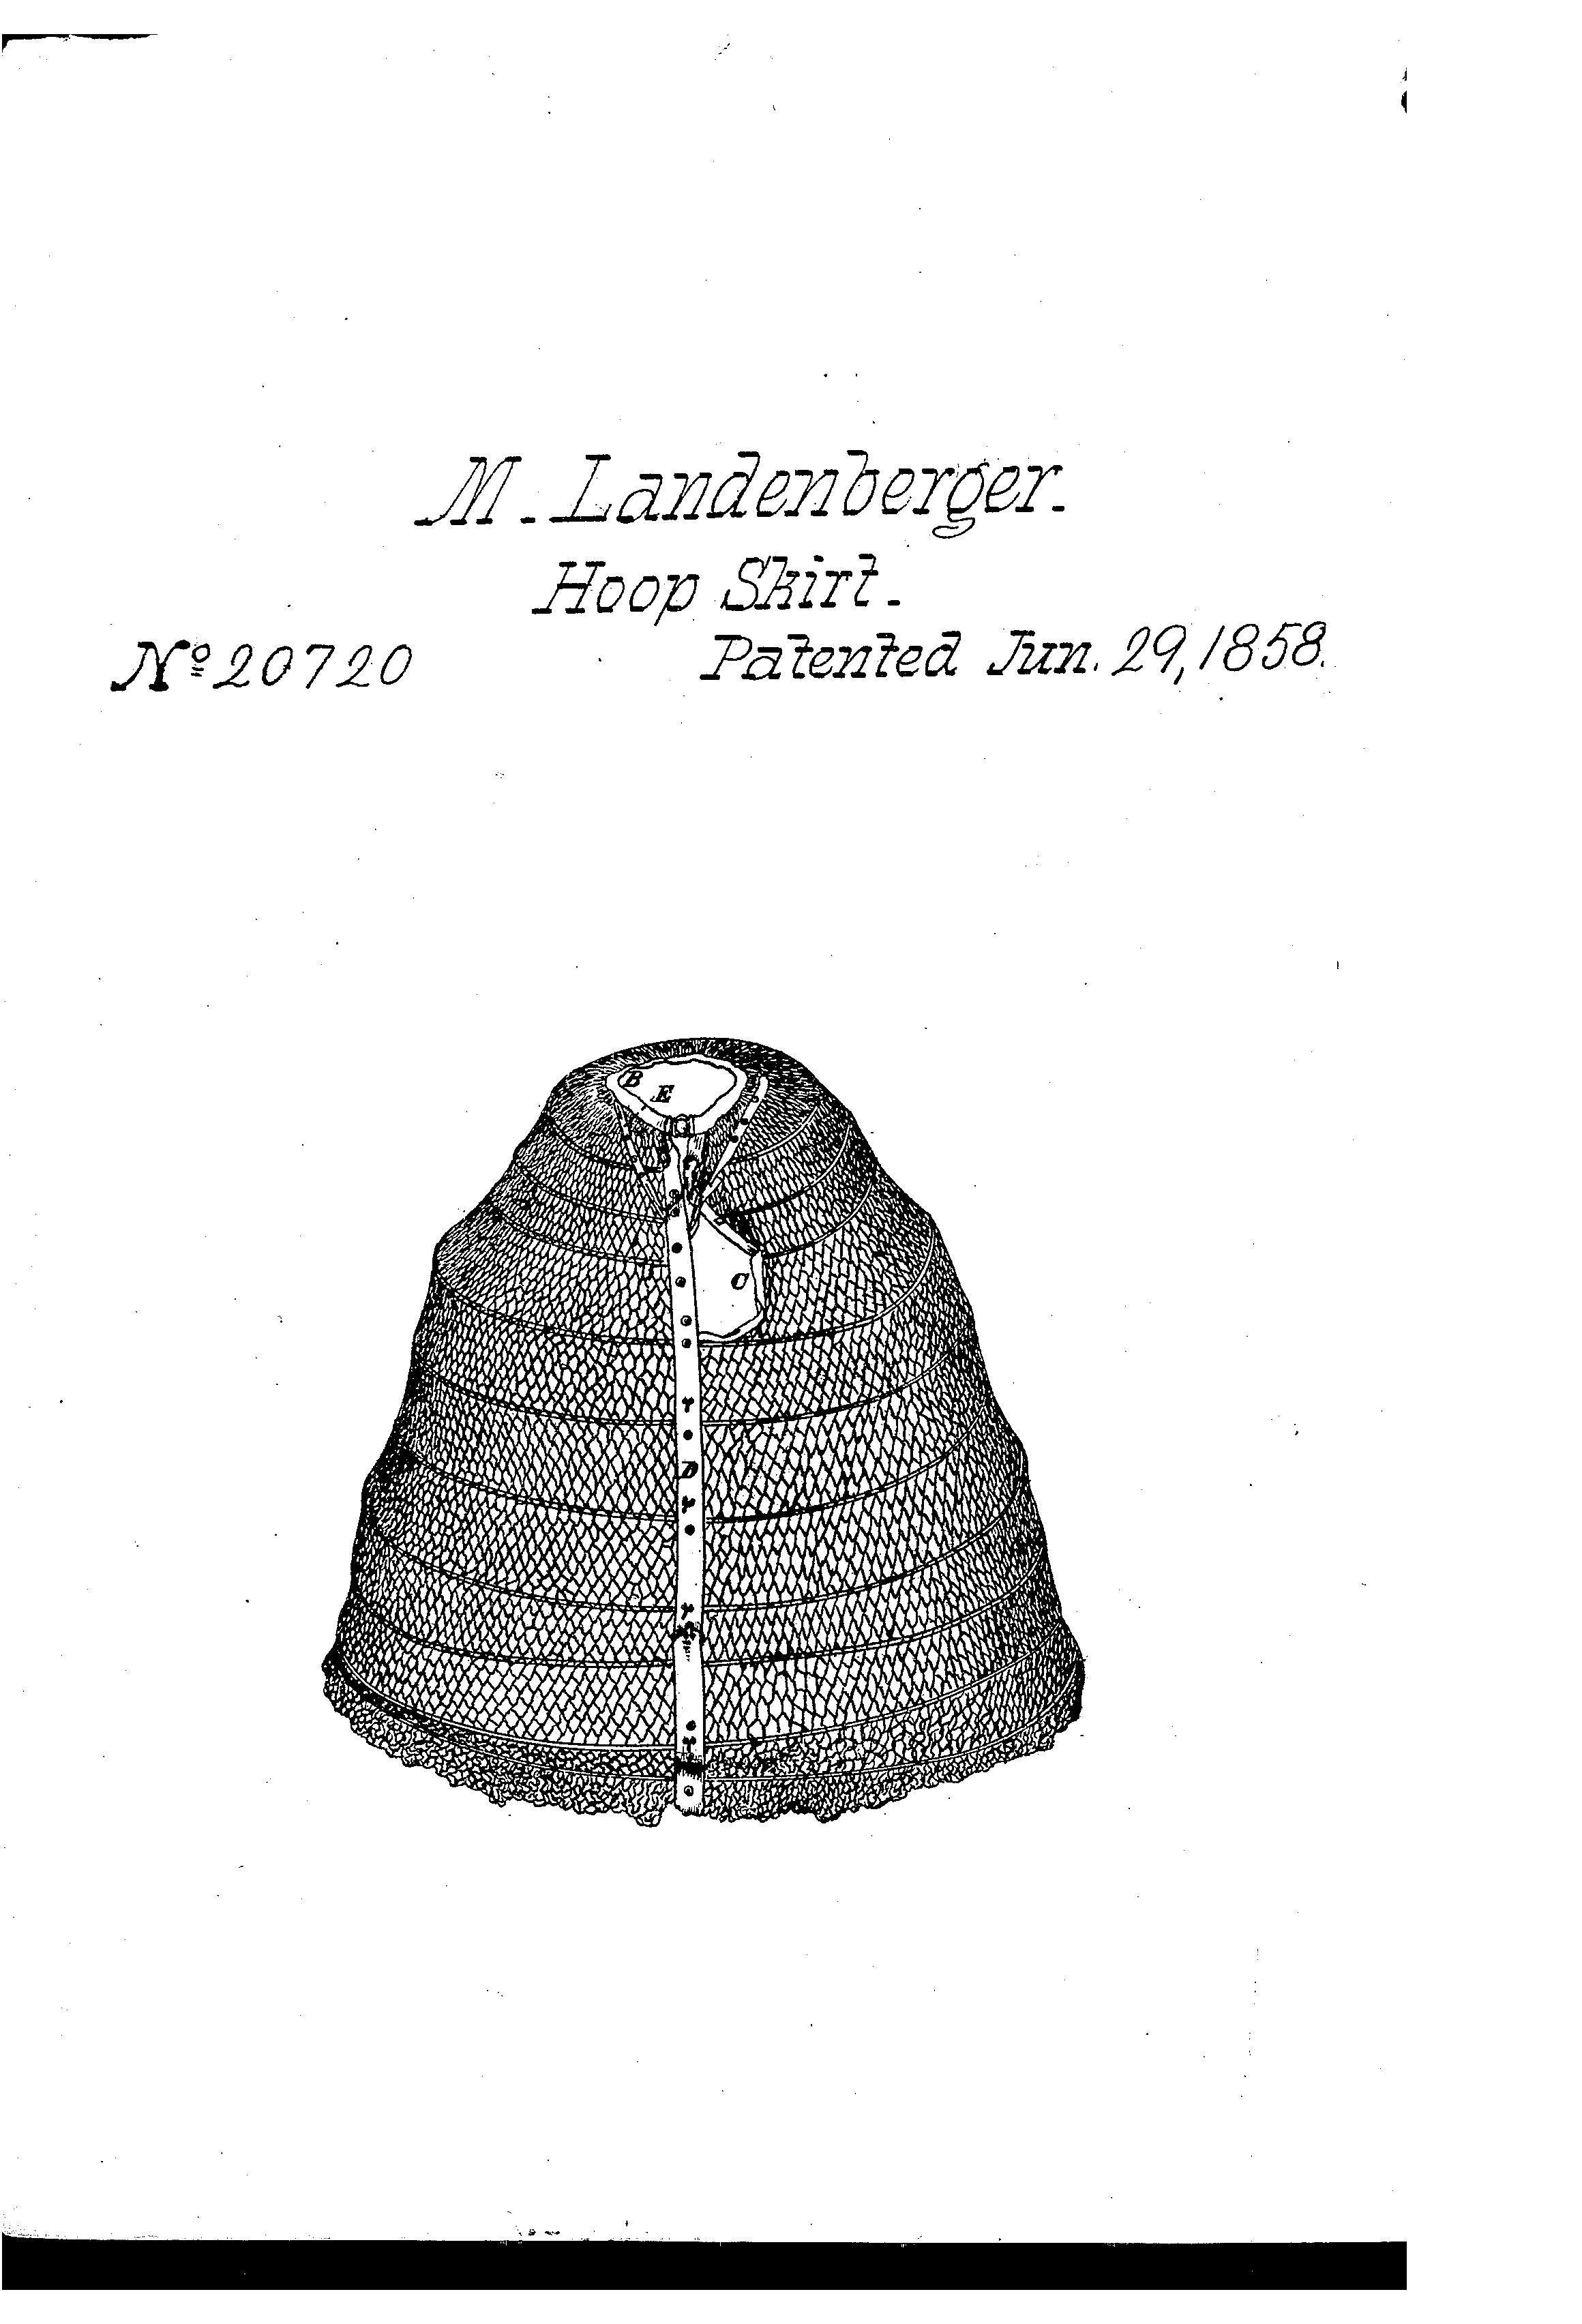 1858, M. Landenberger. Patent 20720. Hoop skirt with a